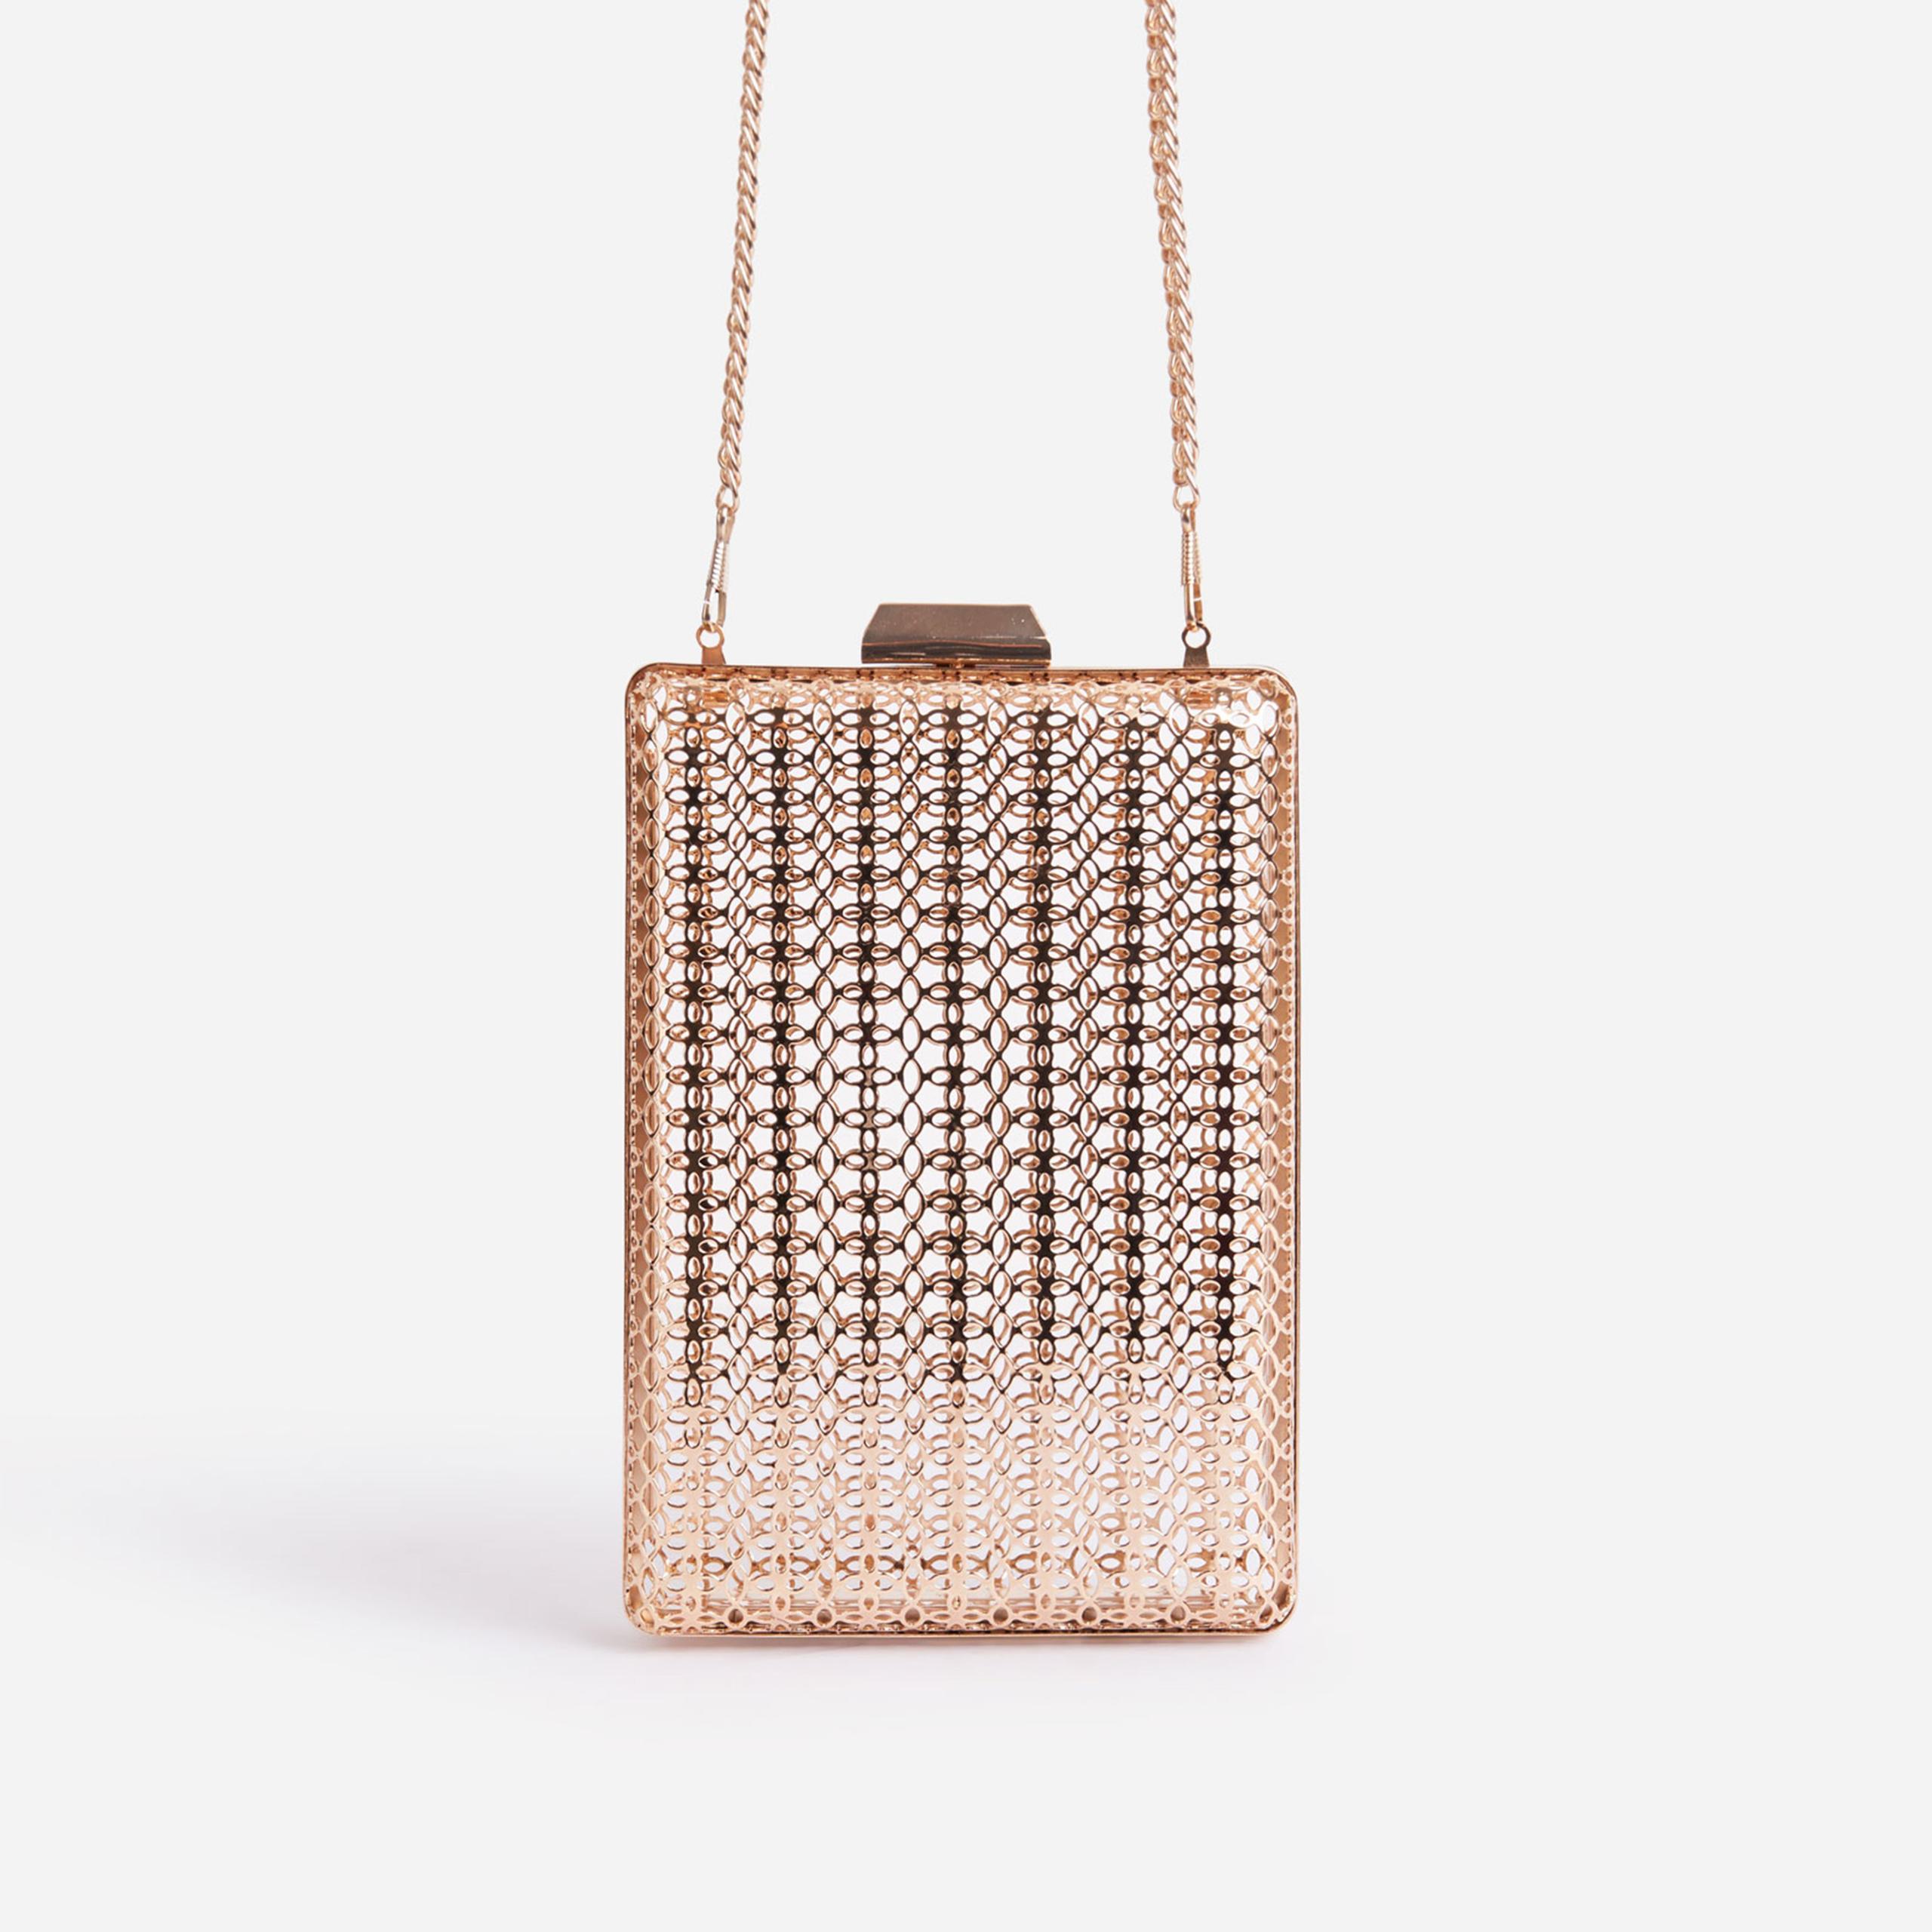 EGO Jessie Cross Body Phone Bag In Metallic Gold,, Gold  - female - Size: One Size